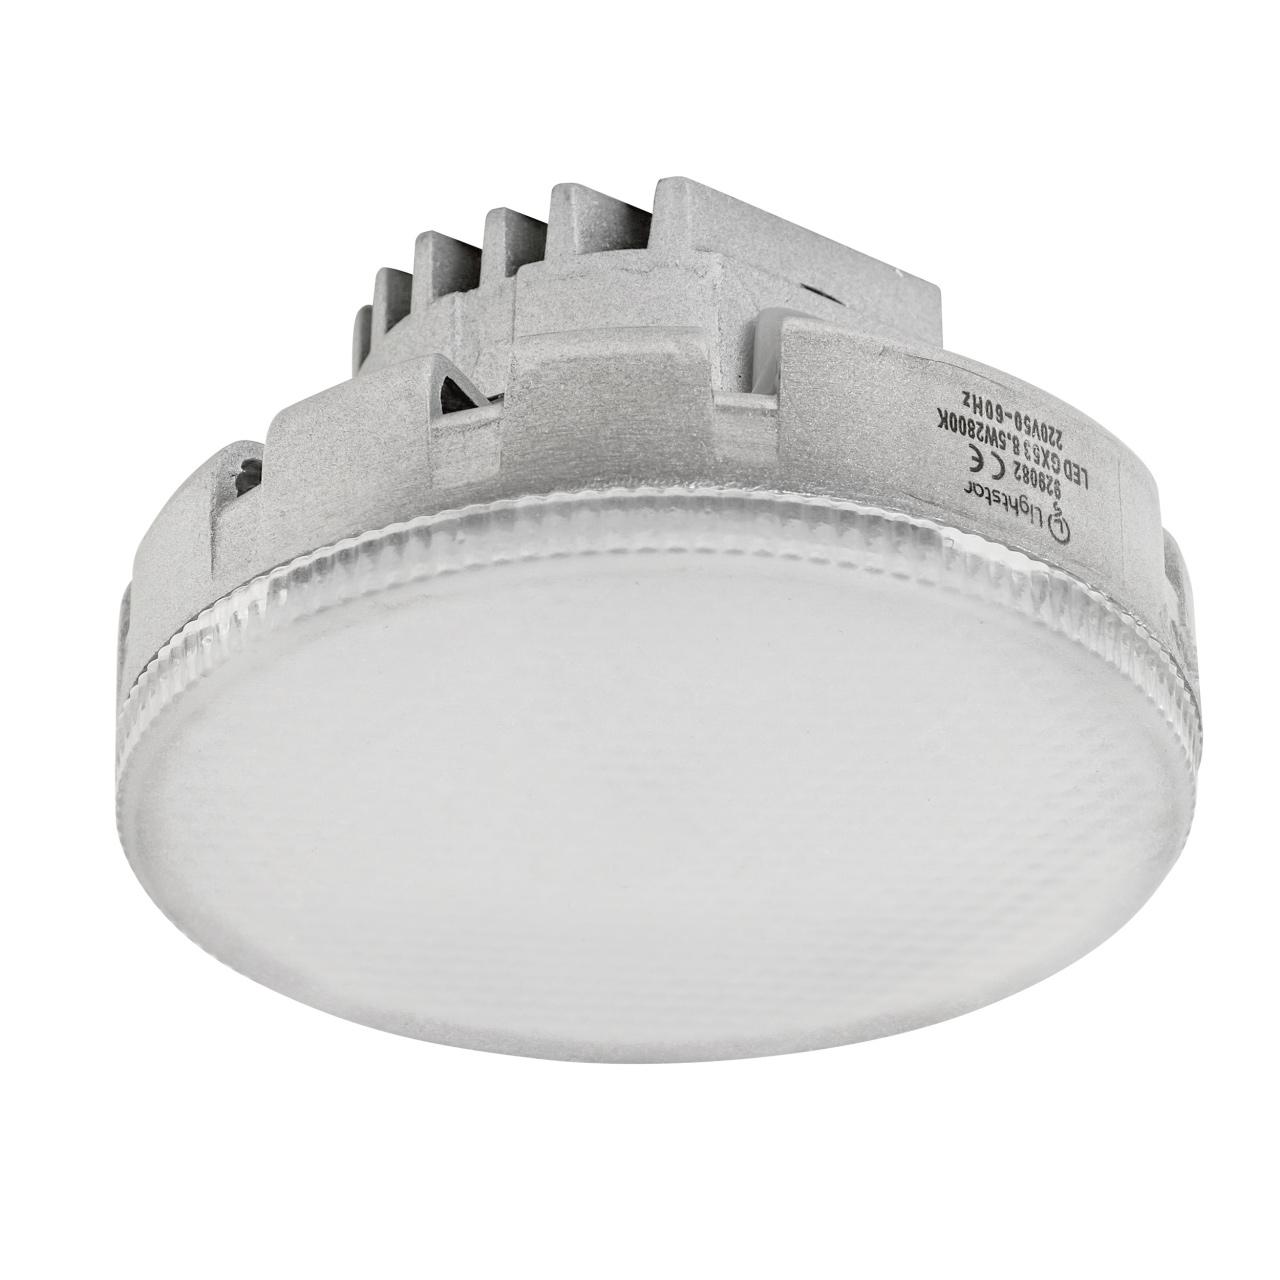 Лампа LED 220V TABL GX53 8.5W=80W 680LM 180G FR 2800K 20000H Lightstar 929082